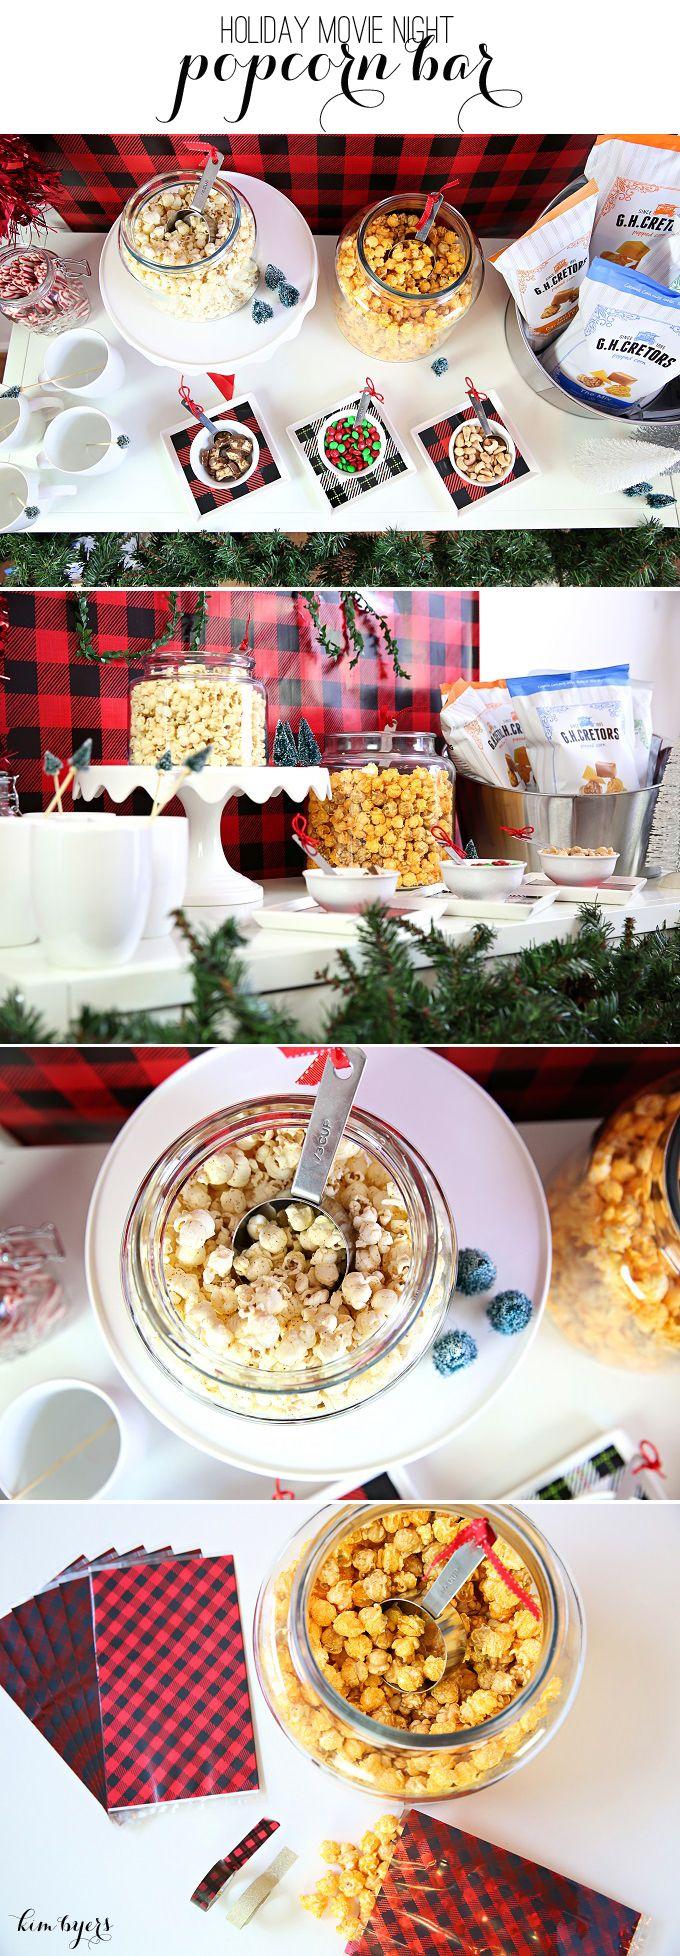 Holiday Movie Night Popcorn Bar in Plaid | Kim Byers TheCelebrationShoppe.com